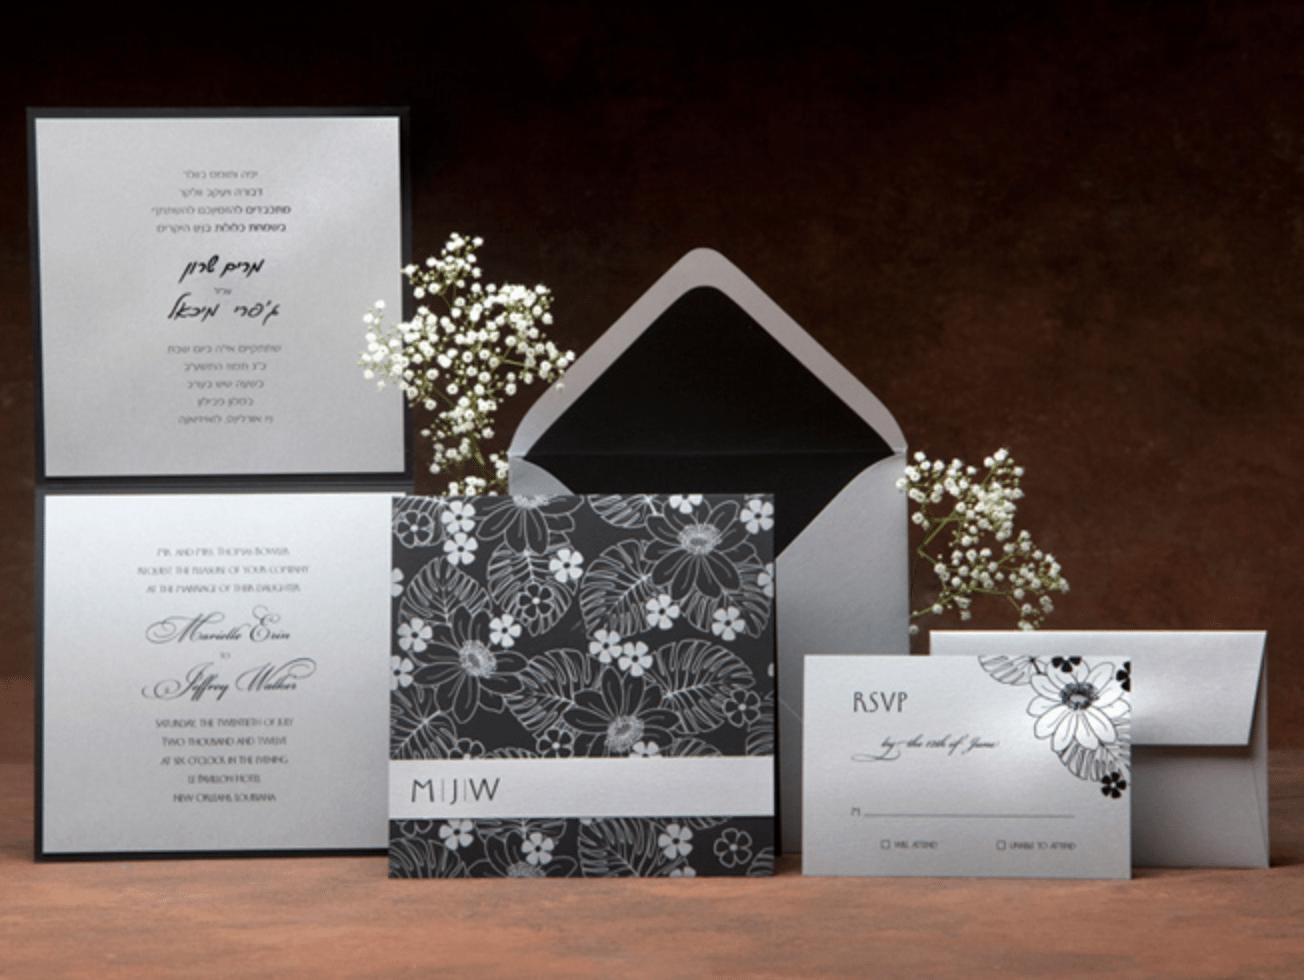 Houstons Leading Designer of Custom Invitations Gifts